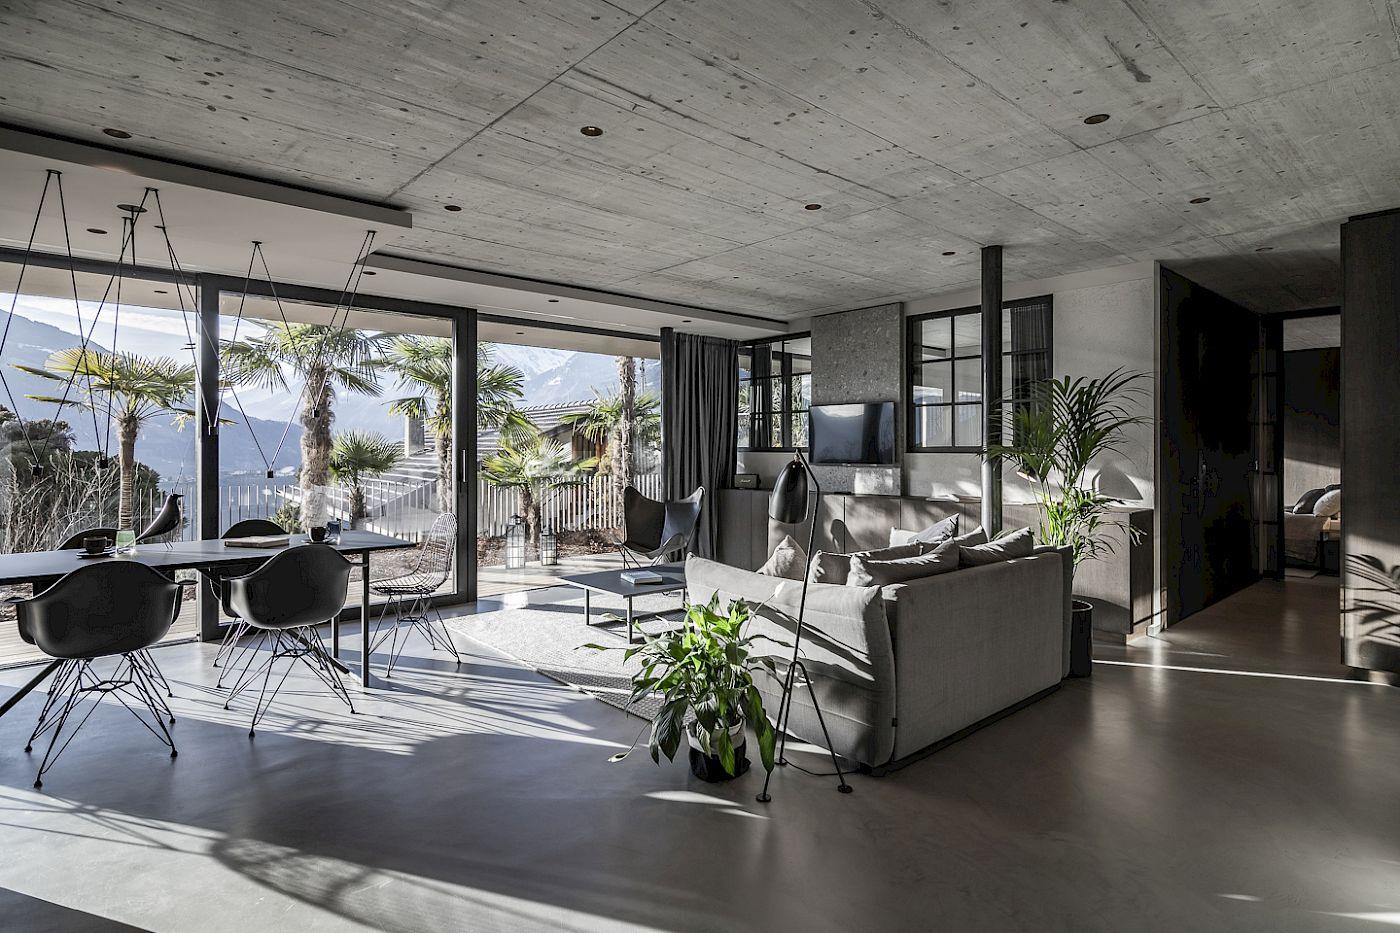 Modepilot Apartment 7 Südtirol Tipp Wochenendtrip